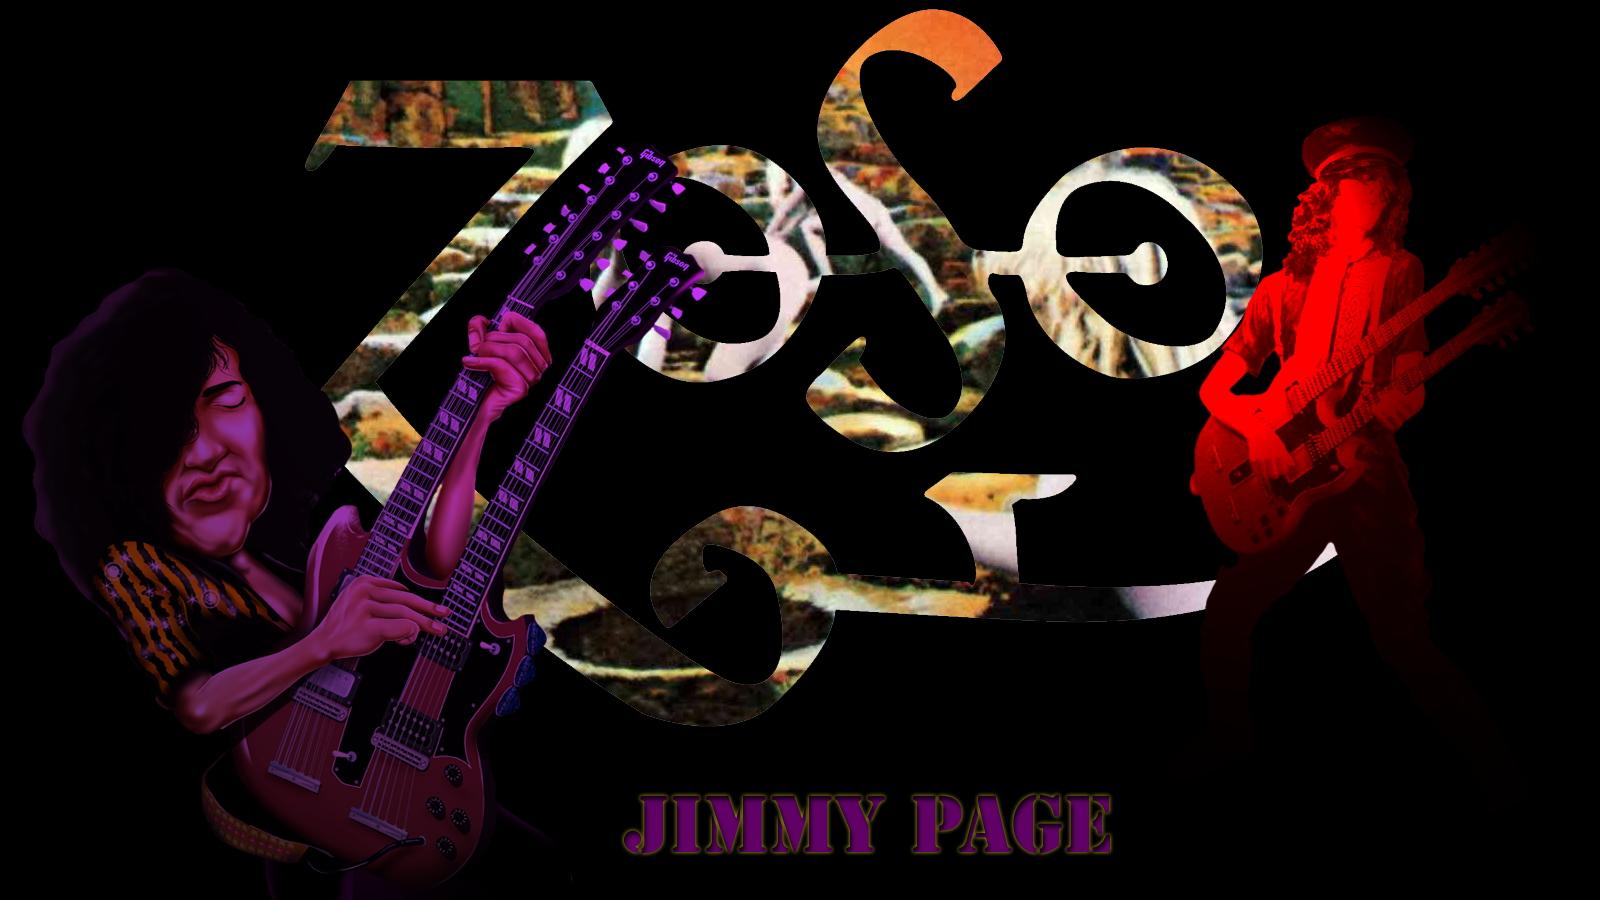 jimmy page wallpaperjpg 1600x900